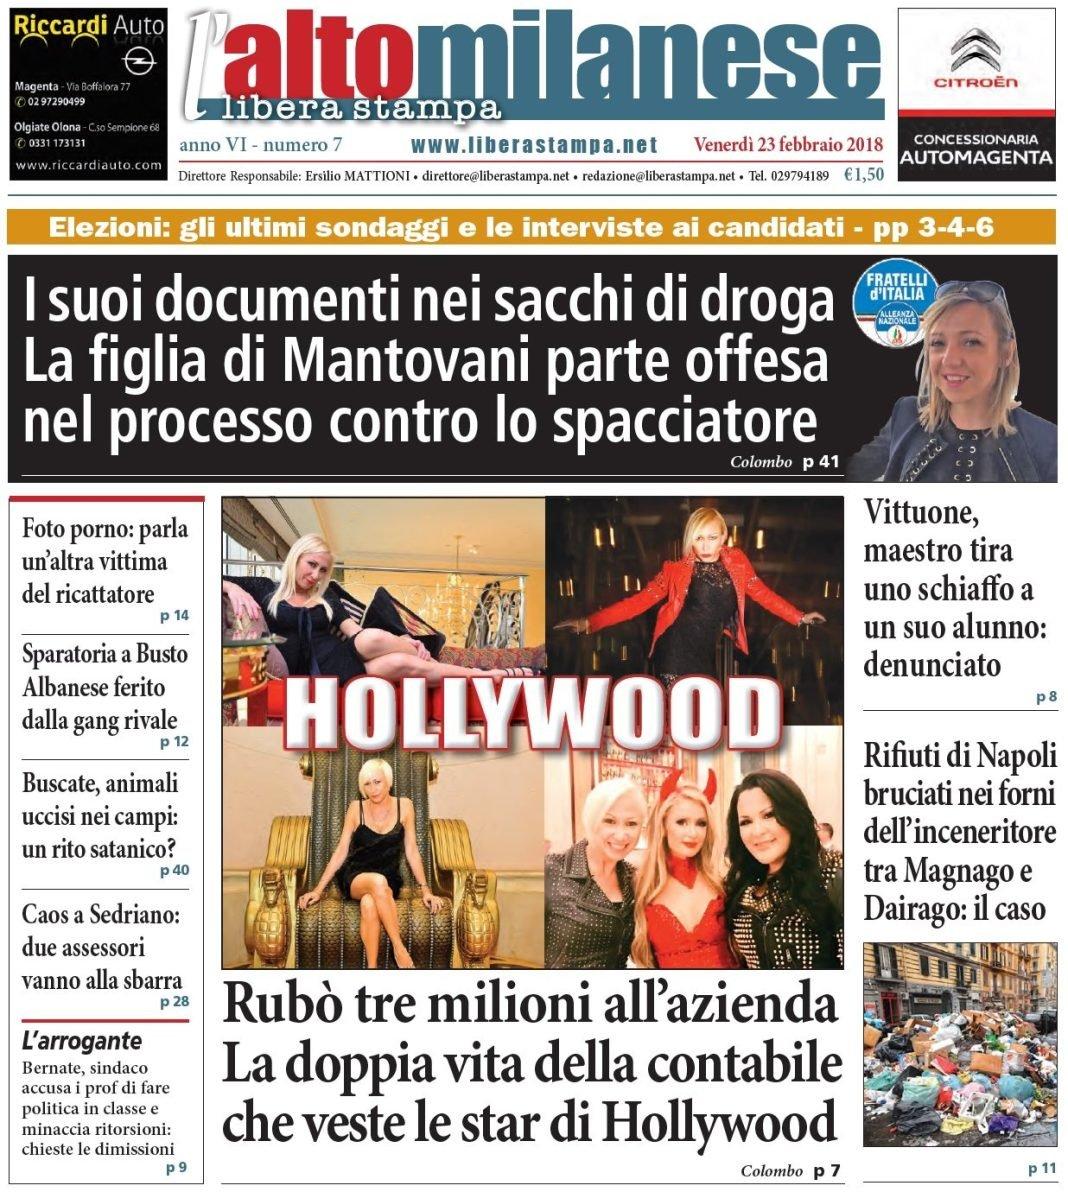 prima-pagina-23-febbraio-2018-anteprima-notizie